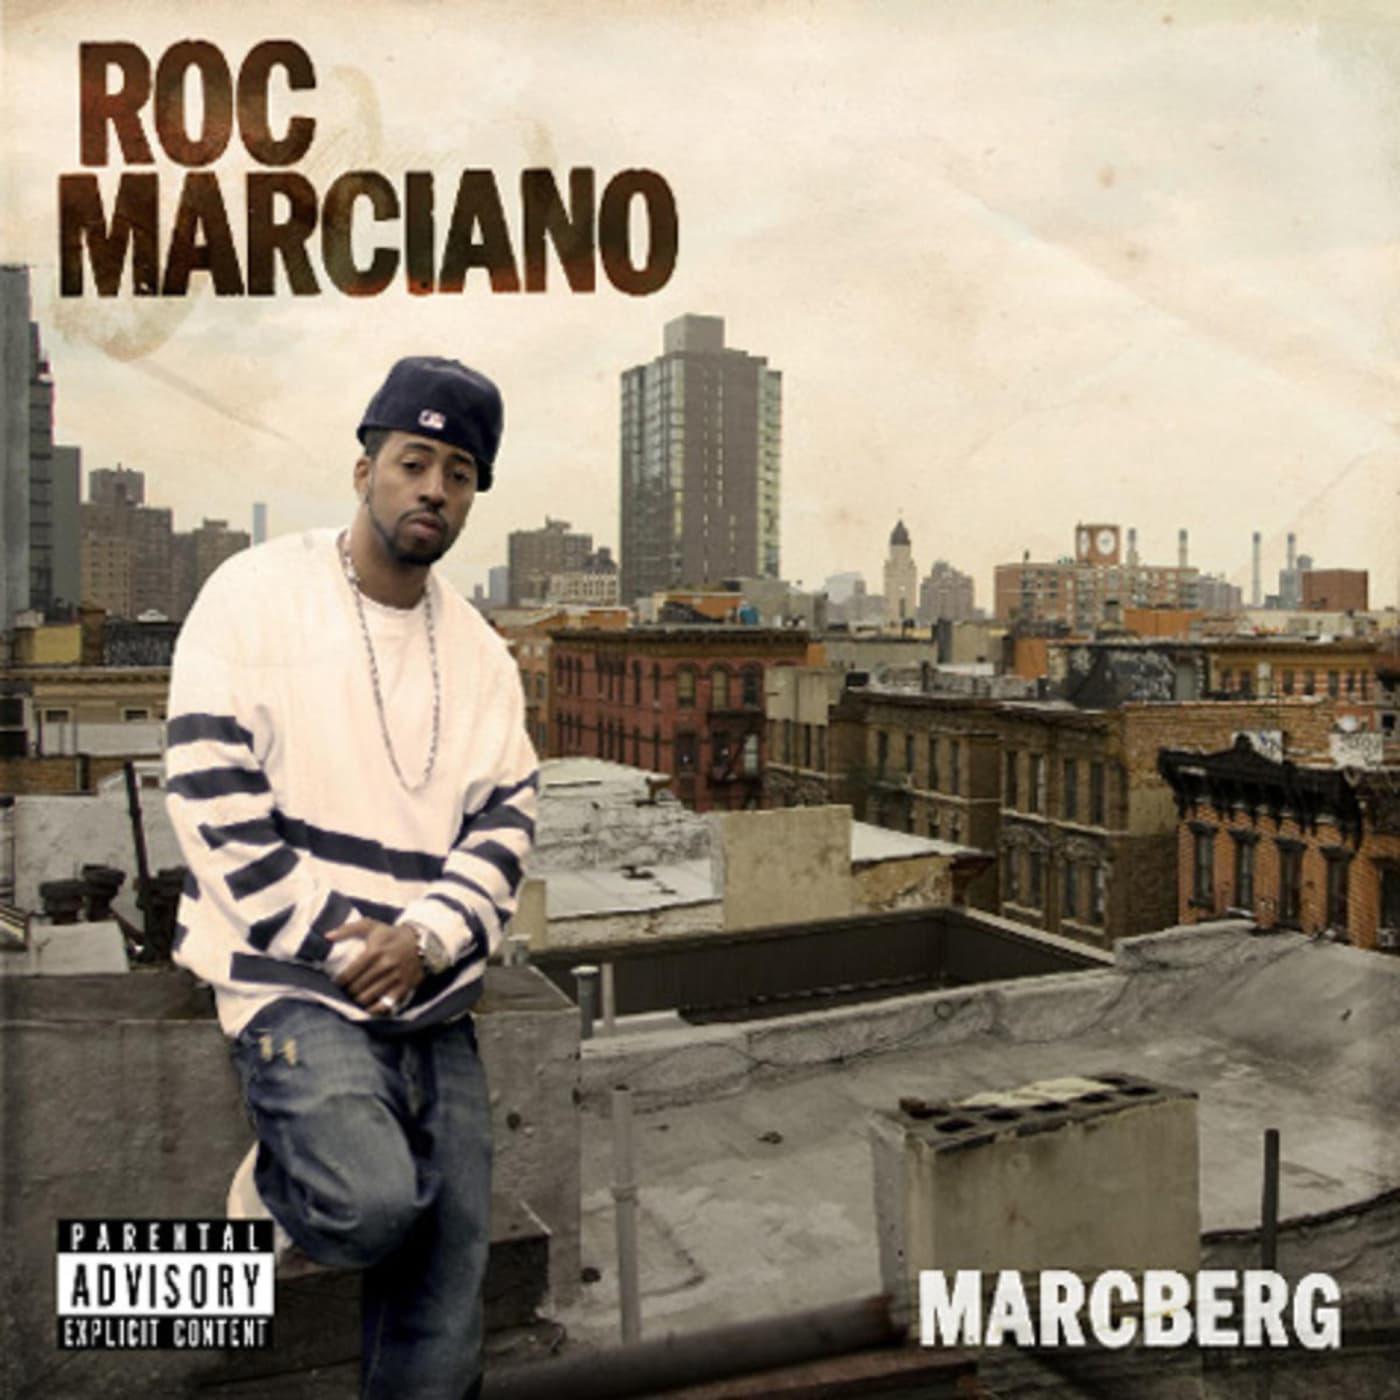 Roc Marciano 'Marcberg'